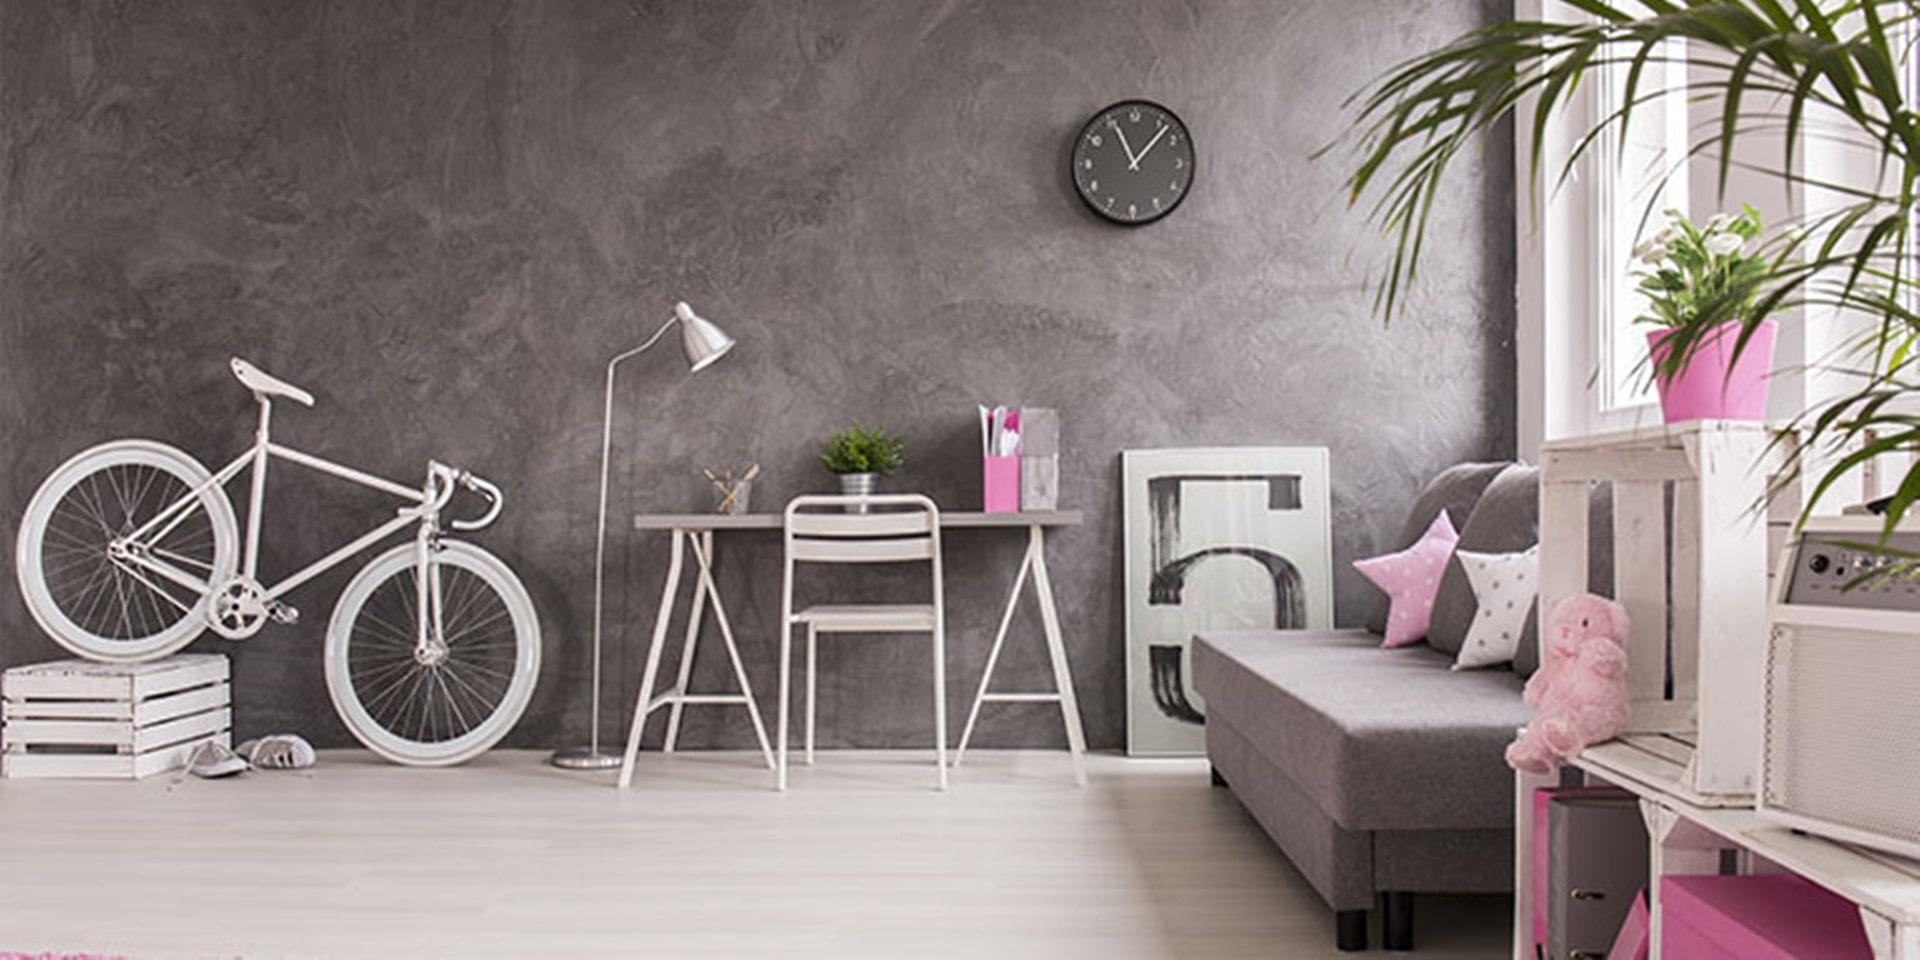 Modern house wall guide